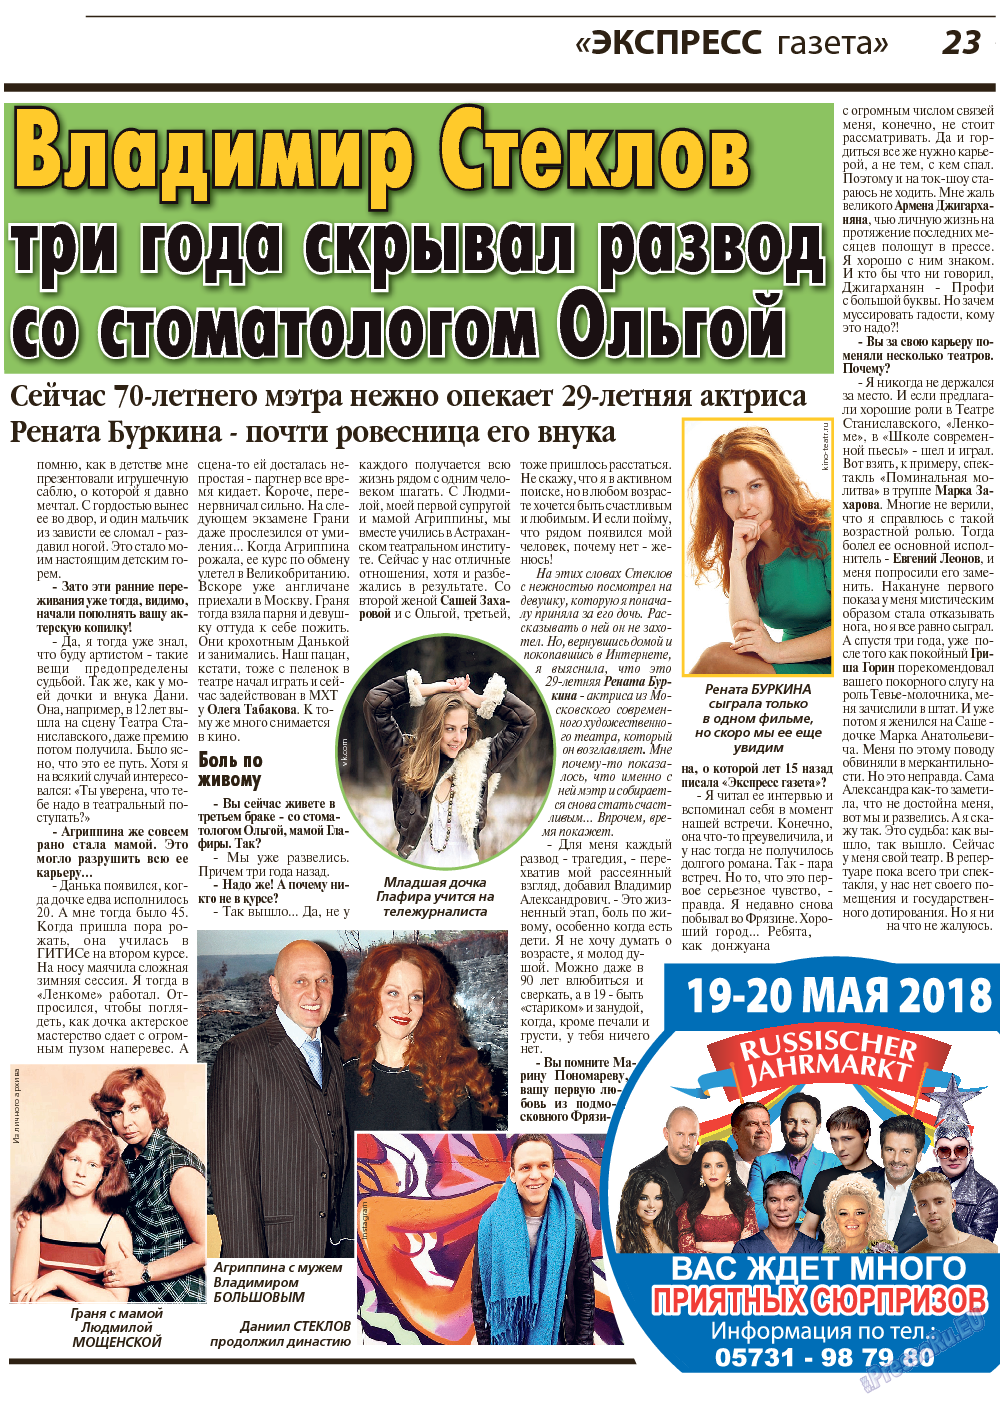 Экспресс газета (газета). 2018 год, номер 2, стр. 23